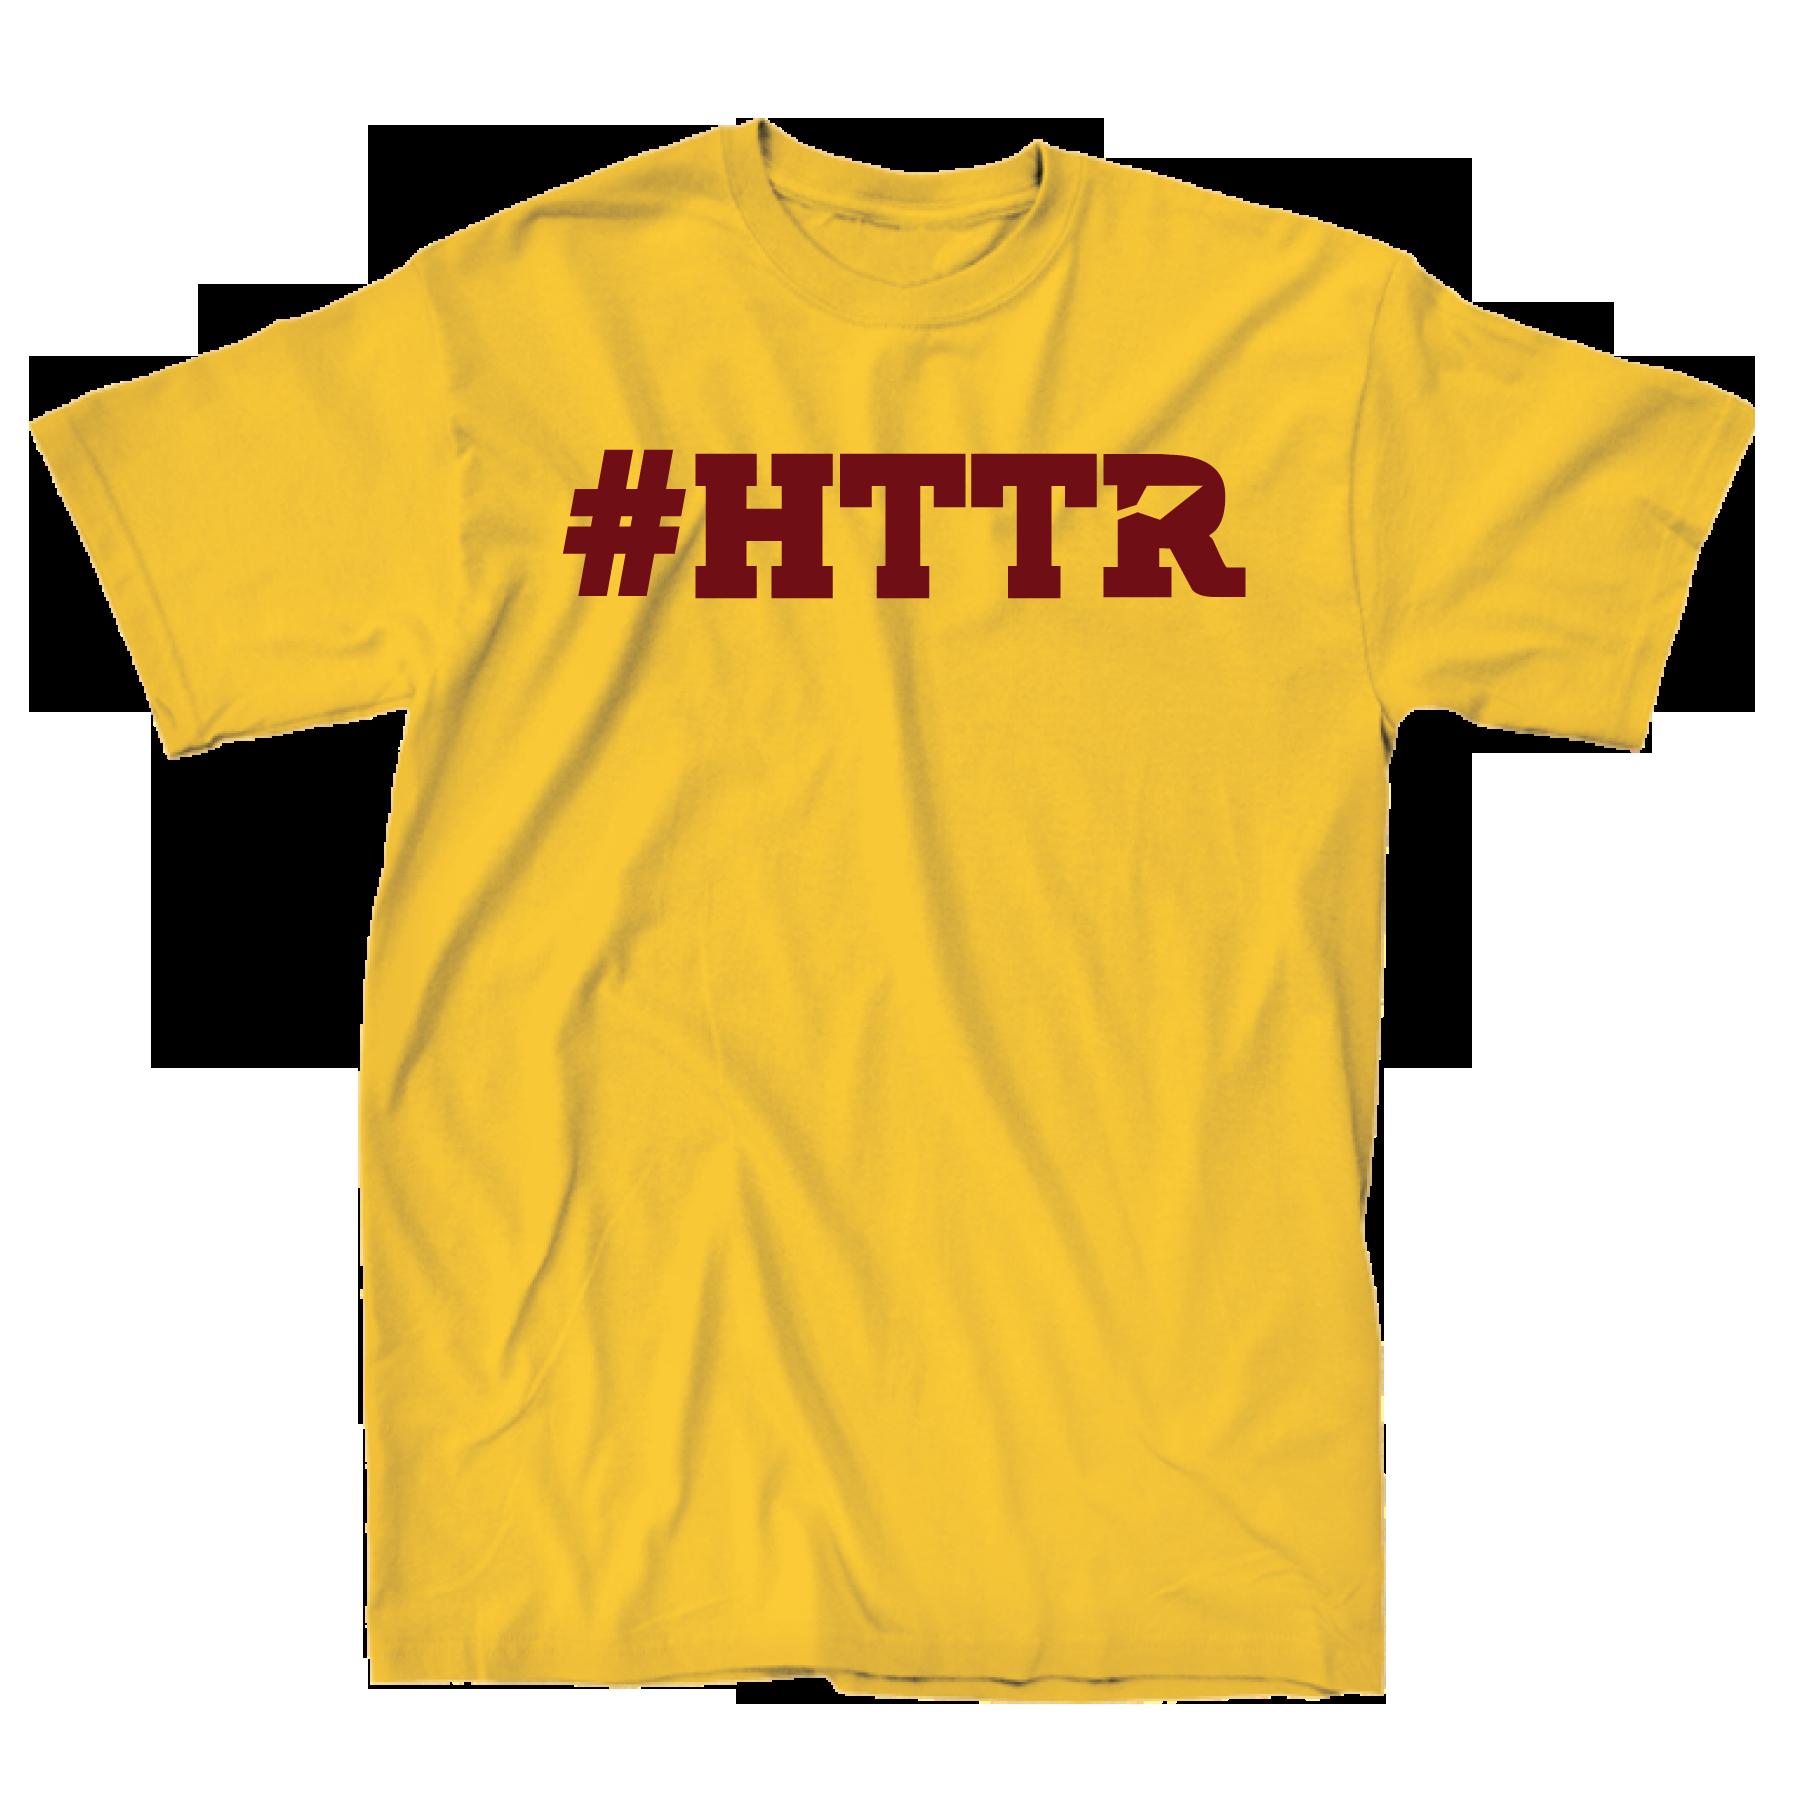 HTTR Shirt Football shirts, Shirts, Redskins football